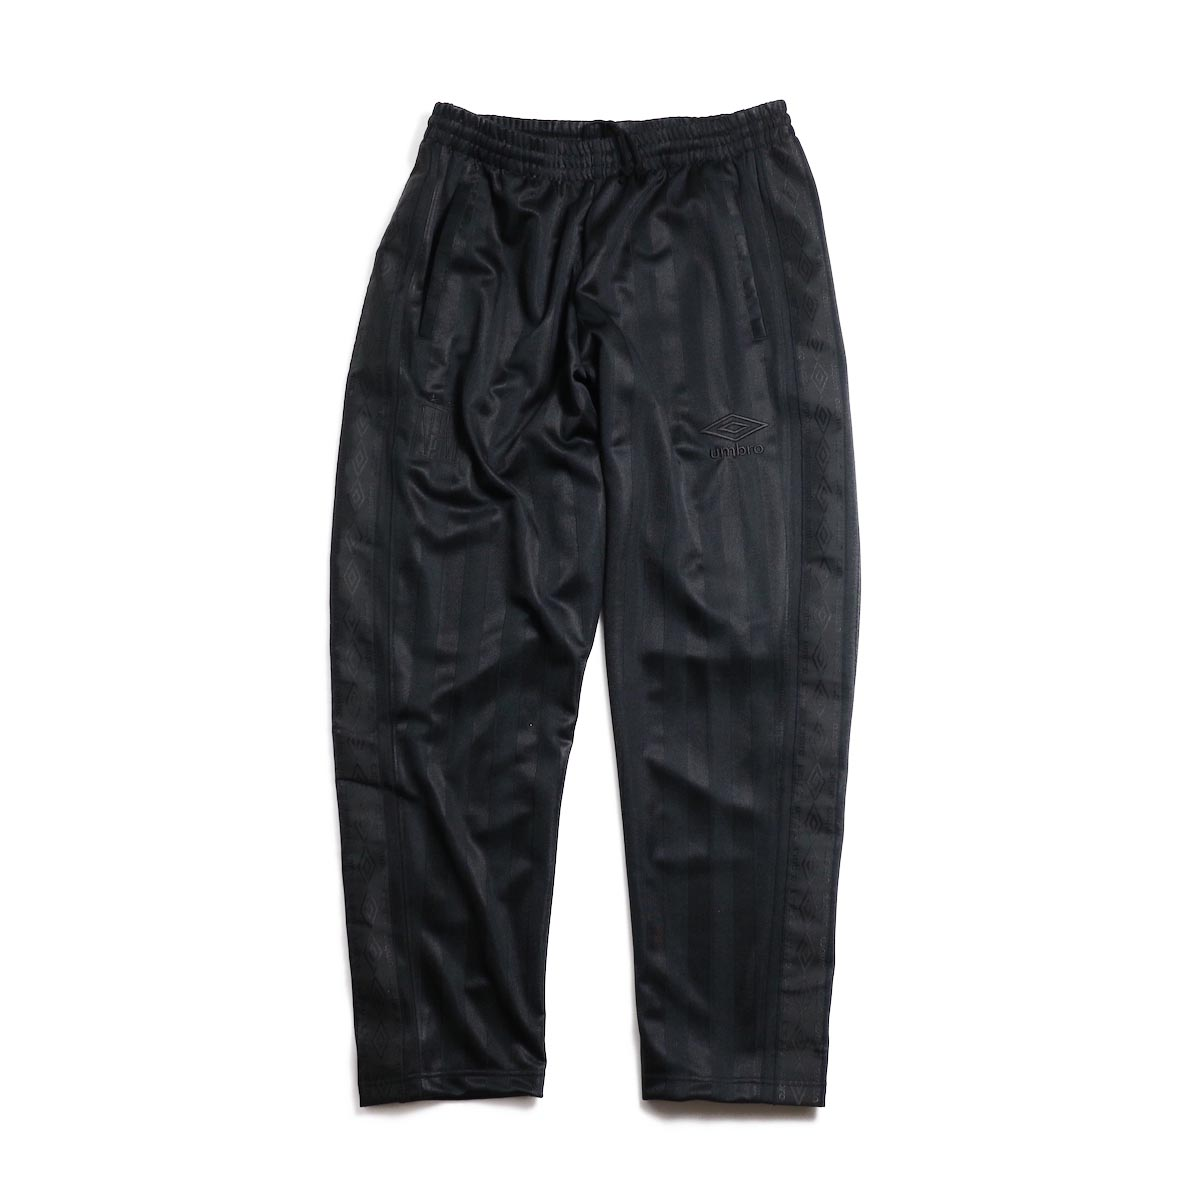 N.HOOLYWOOD × umbro / 191-CP50 Track Pants